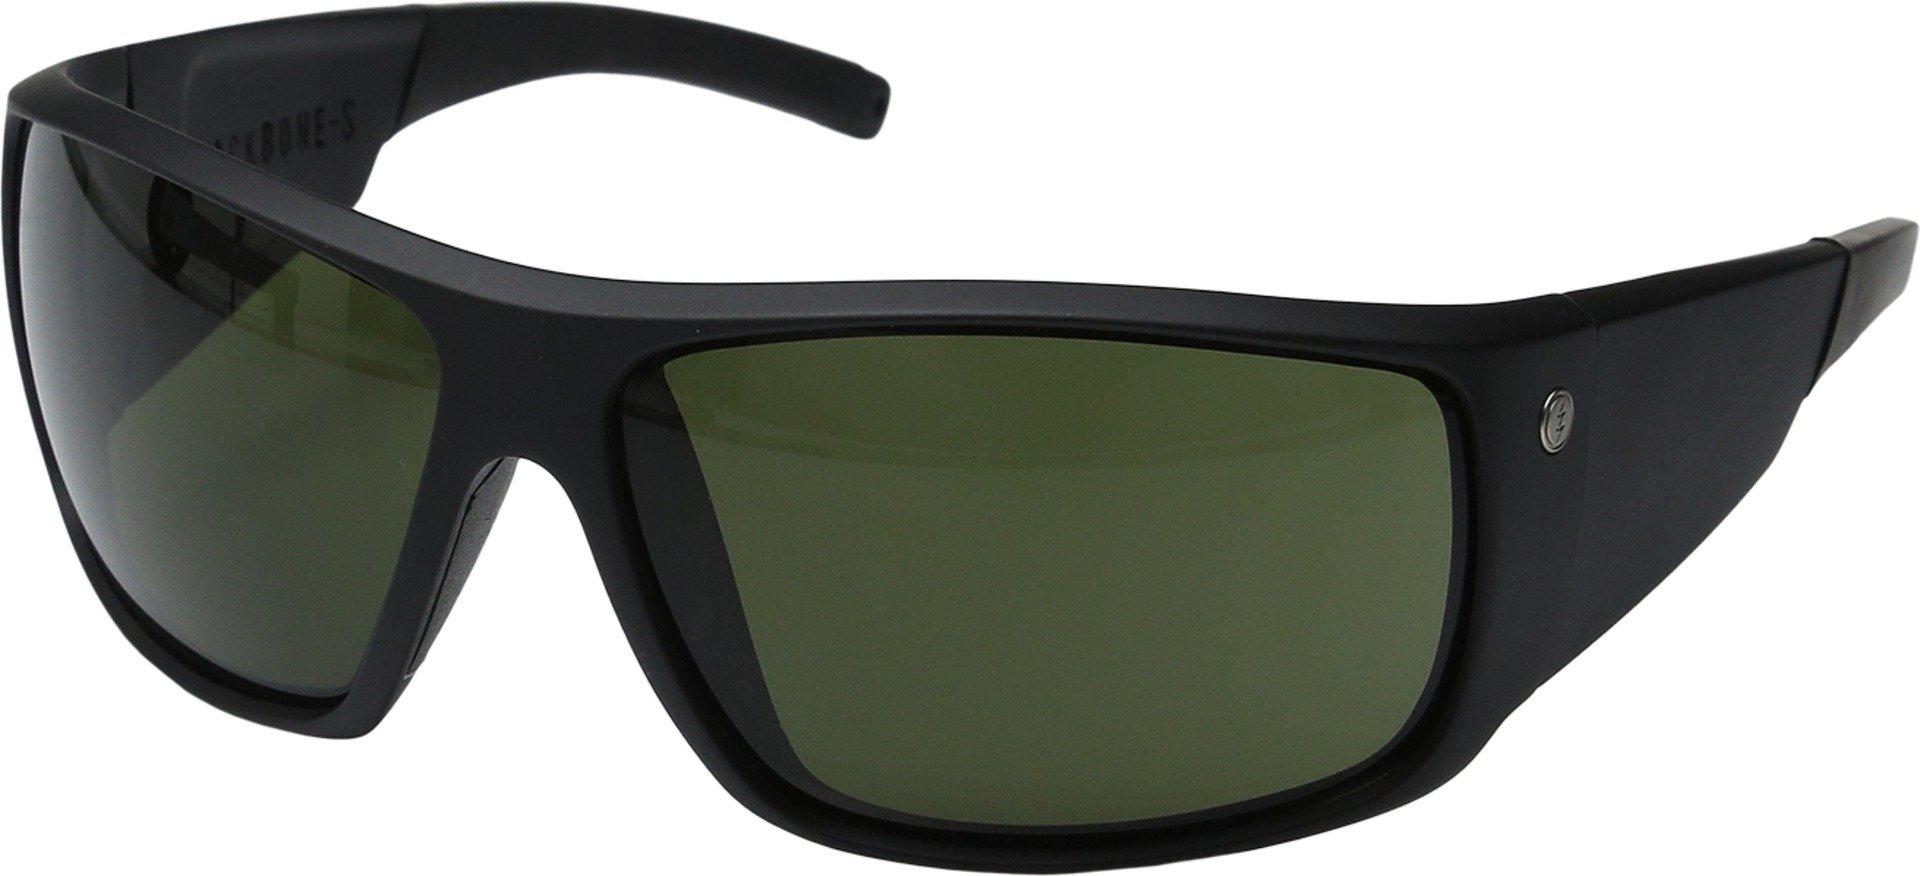 Electric Unisex Backbone S Sunglasses, Matte Black/Melanin Grey, One Size